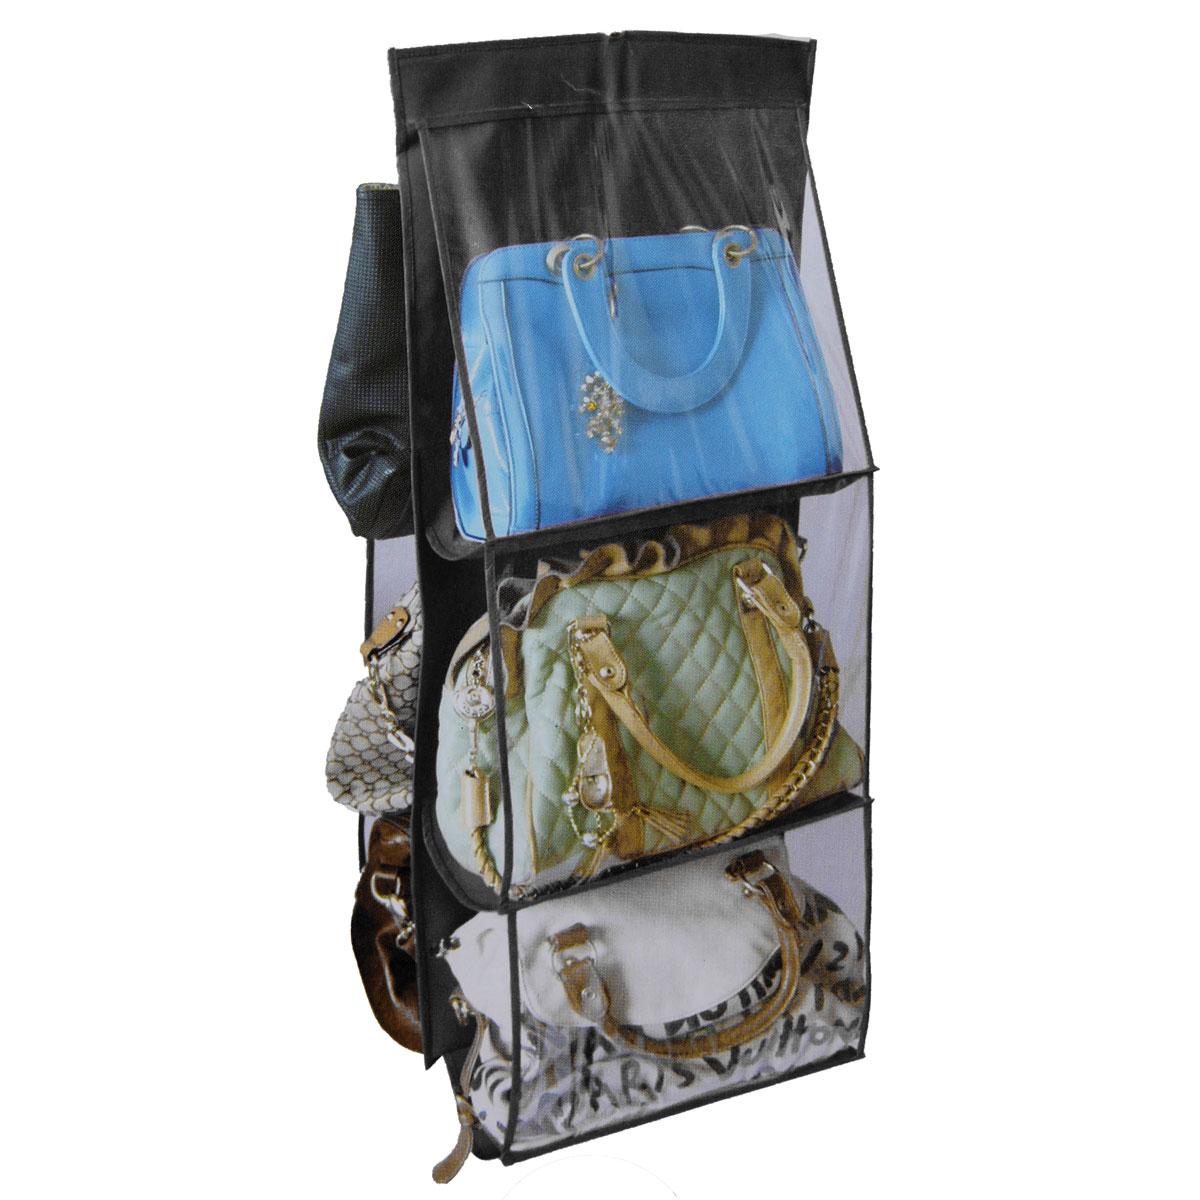 6 pocket hanging handbag purse bag tidy organiser storage - Handbag hanger for closet ...